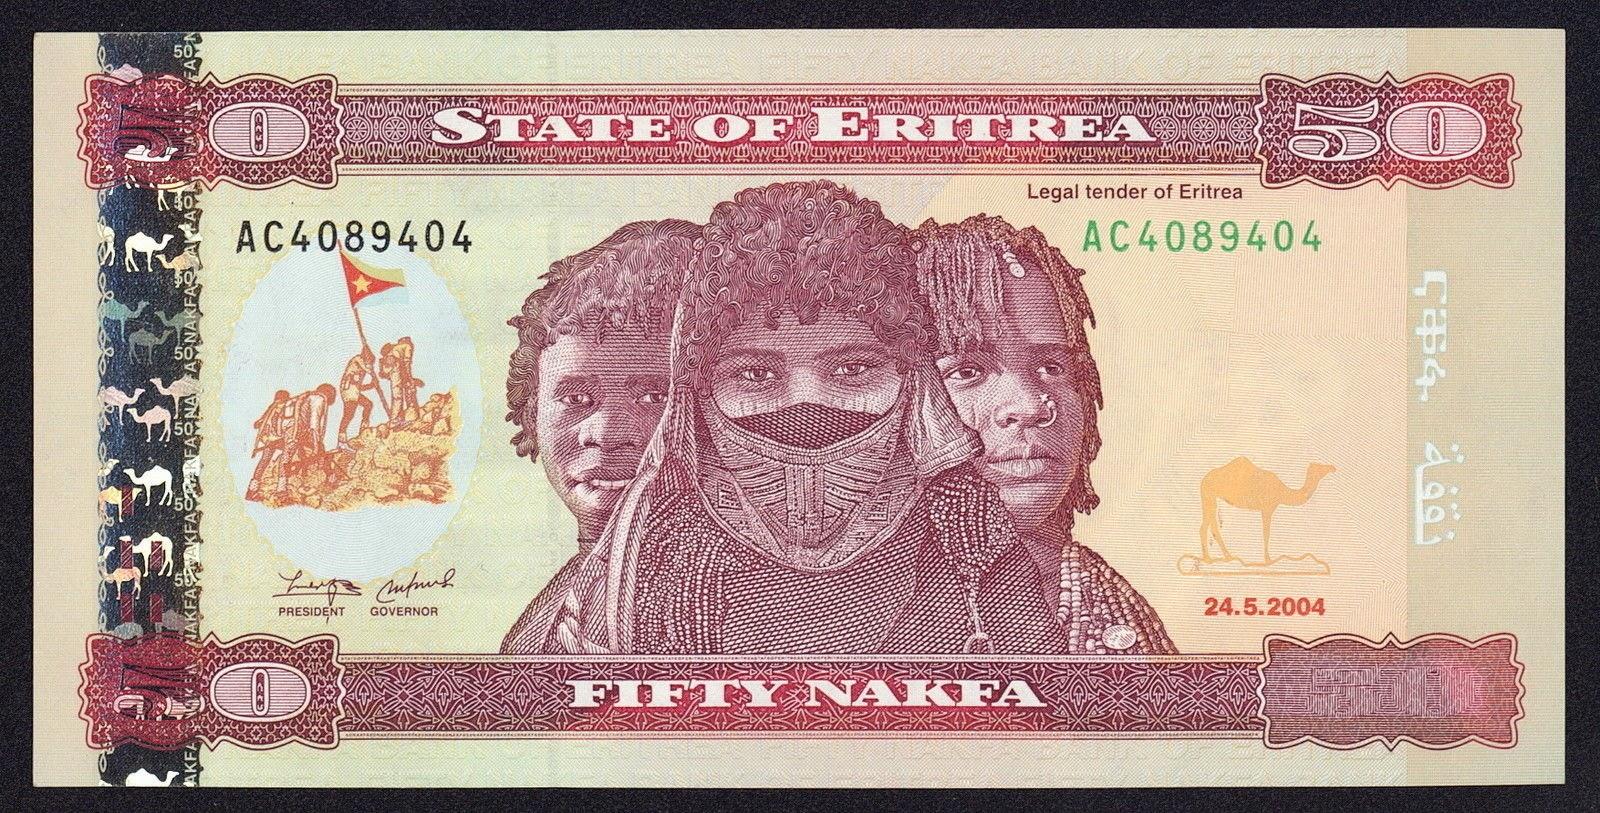 Eritrea banknotes 50 Eritrean nakfa note